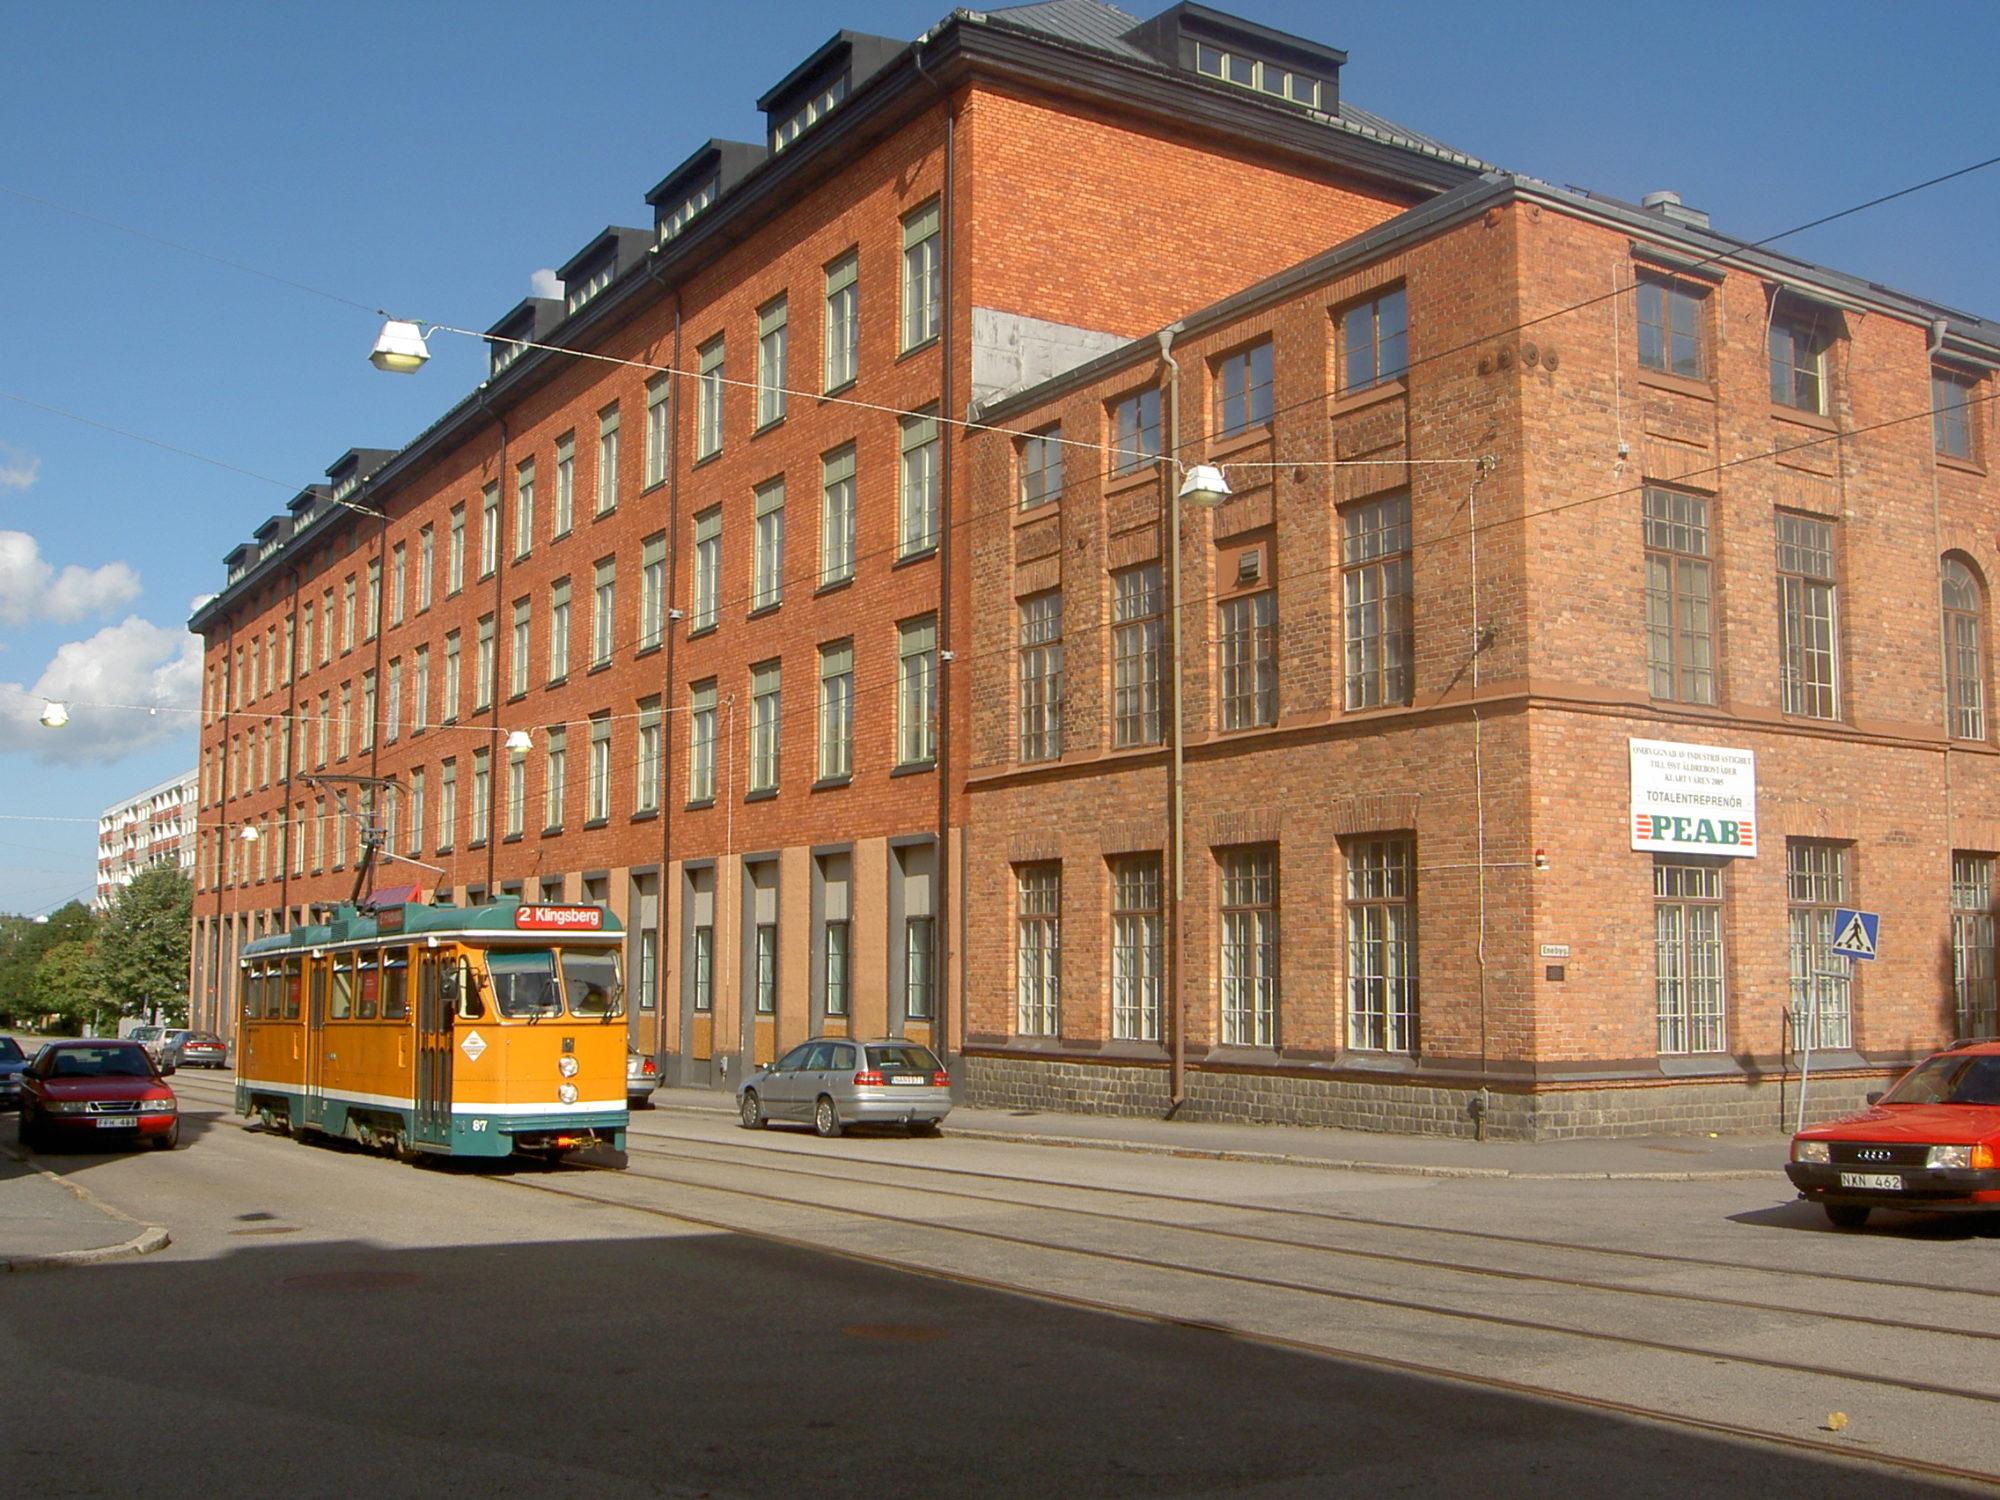 Kv Järven, Norrköping